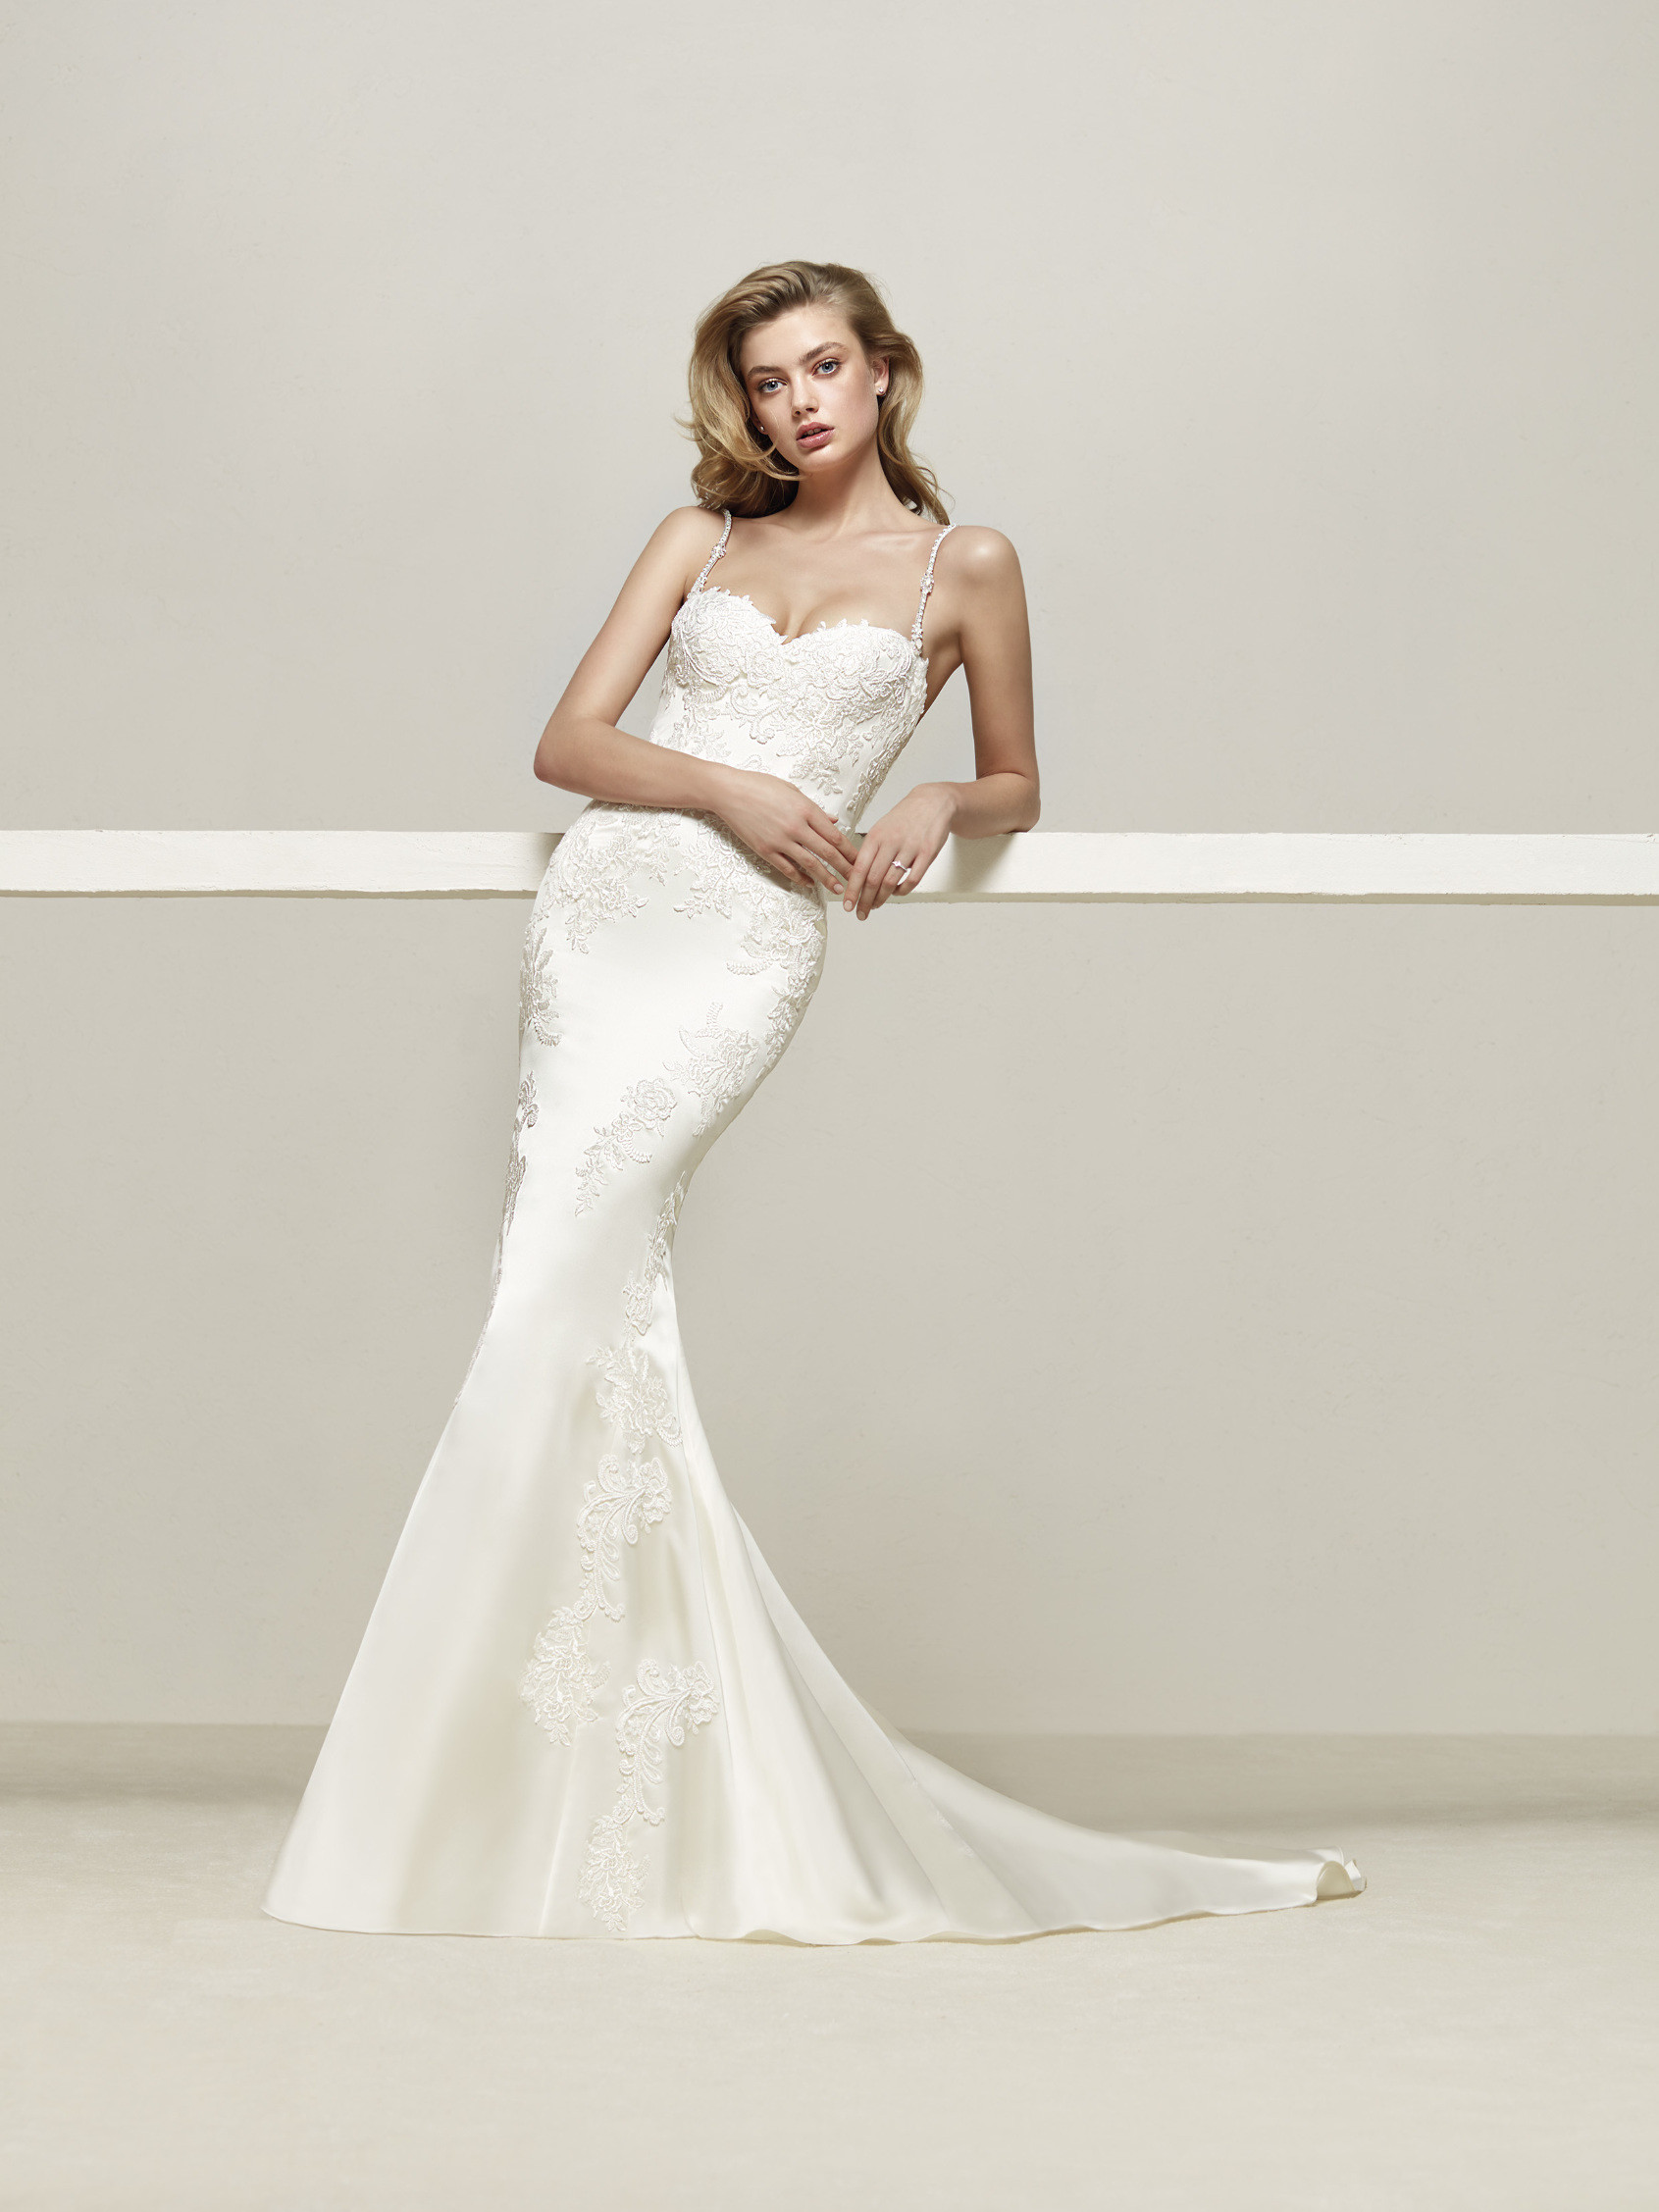 2836dfcfeb6 Pronovias Wedding Dress Sale Ireland - Gomes Weine AG